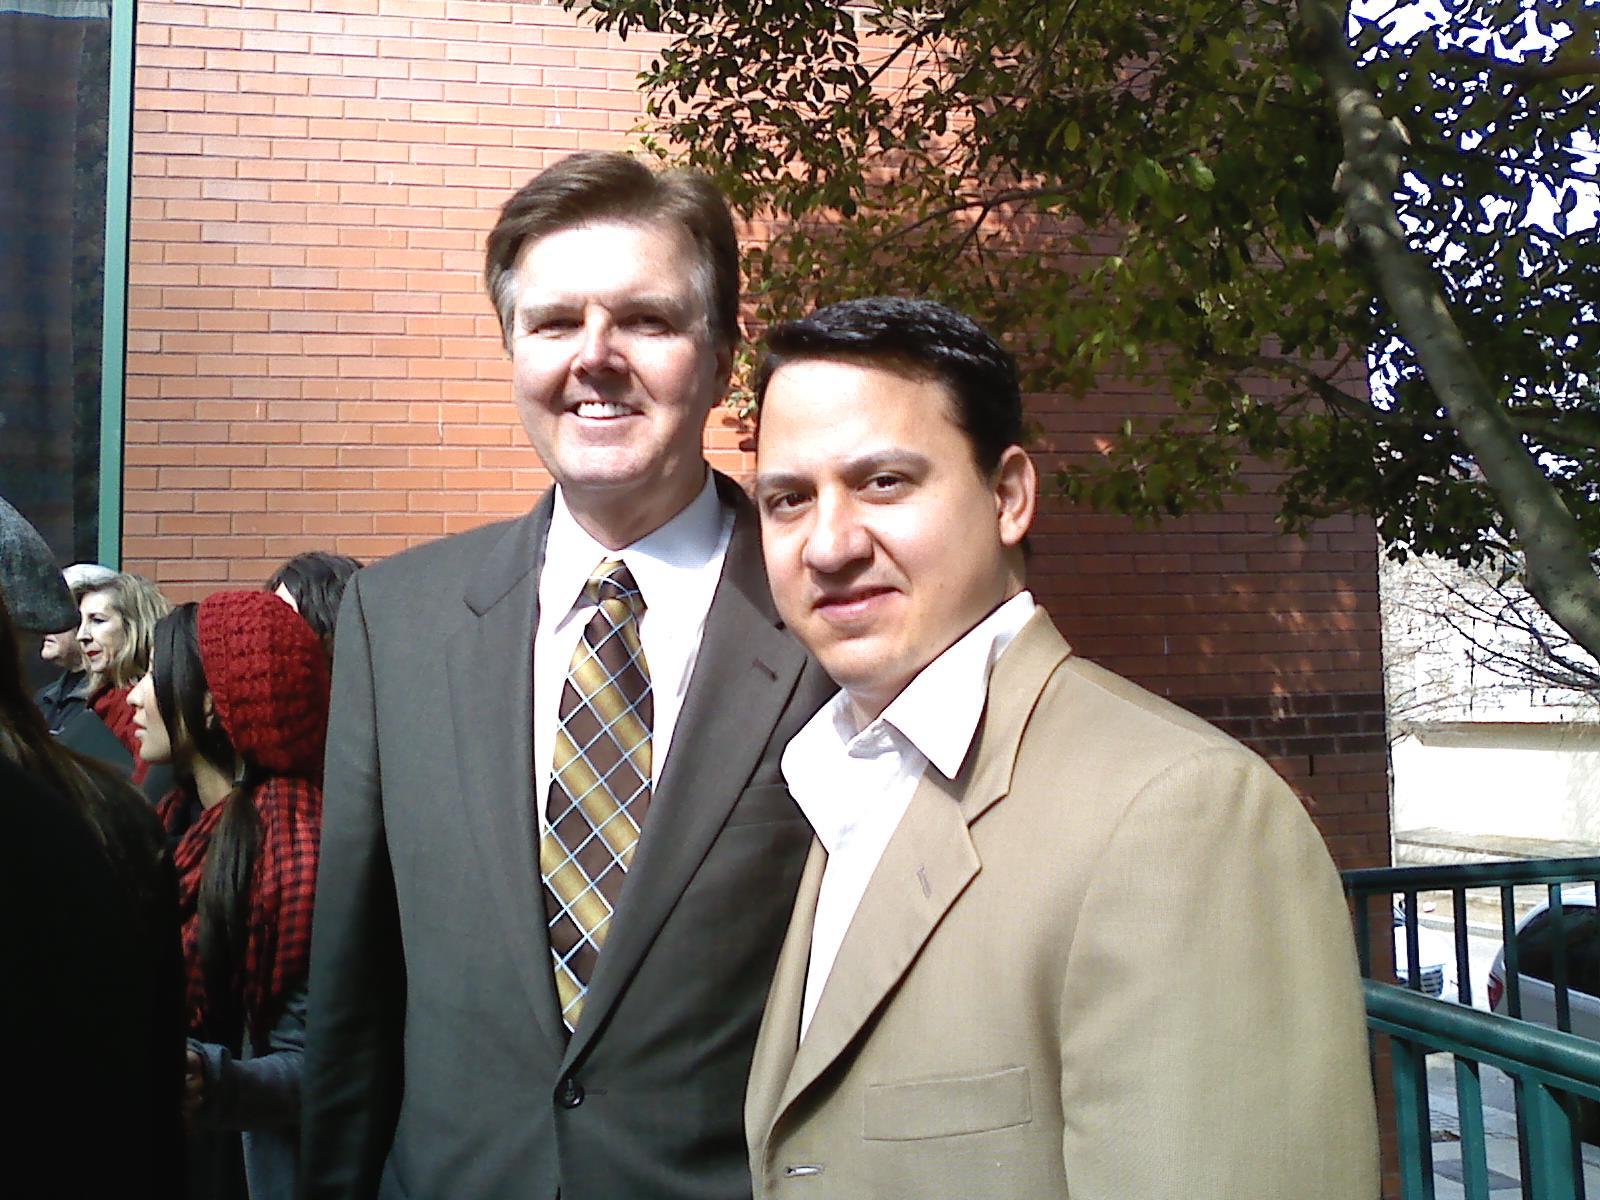 Jonathan with Sen. Dan Patrick of Houston, author of Ultrasound Bill (SB 182)